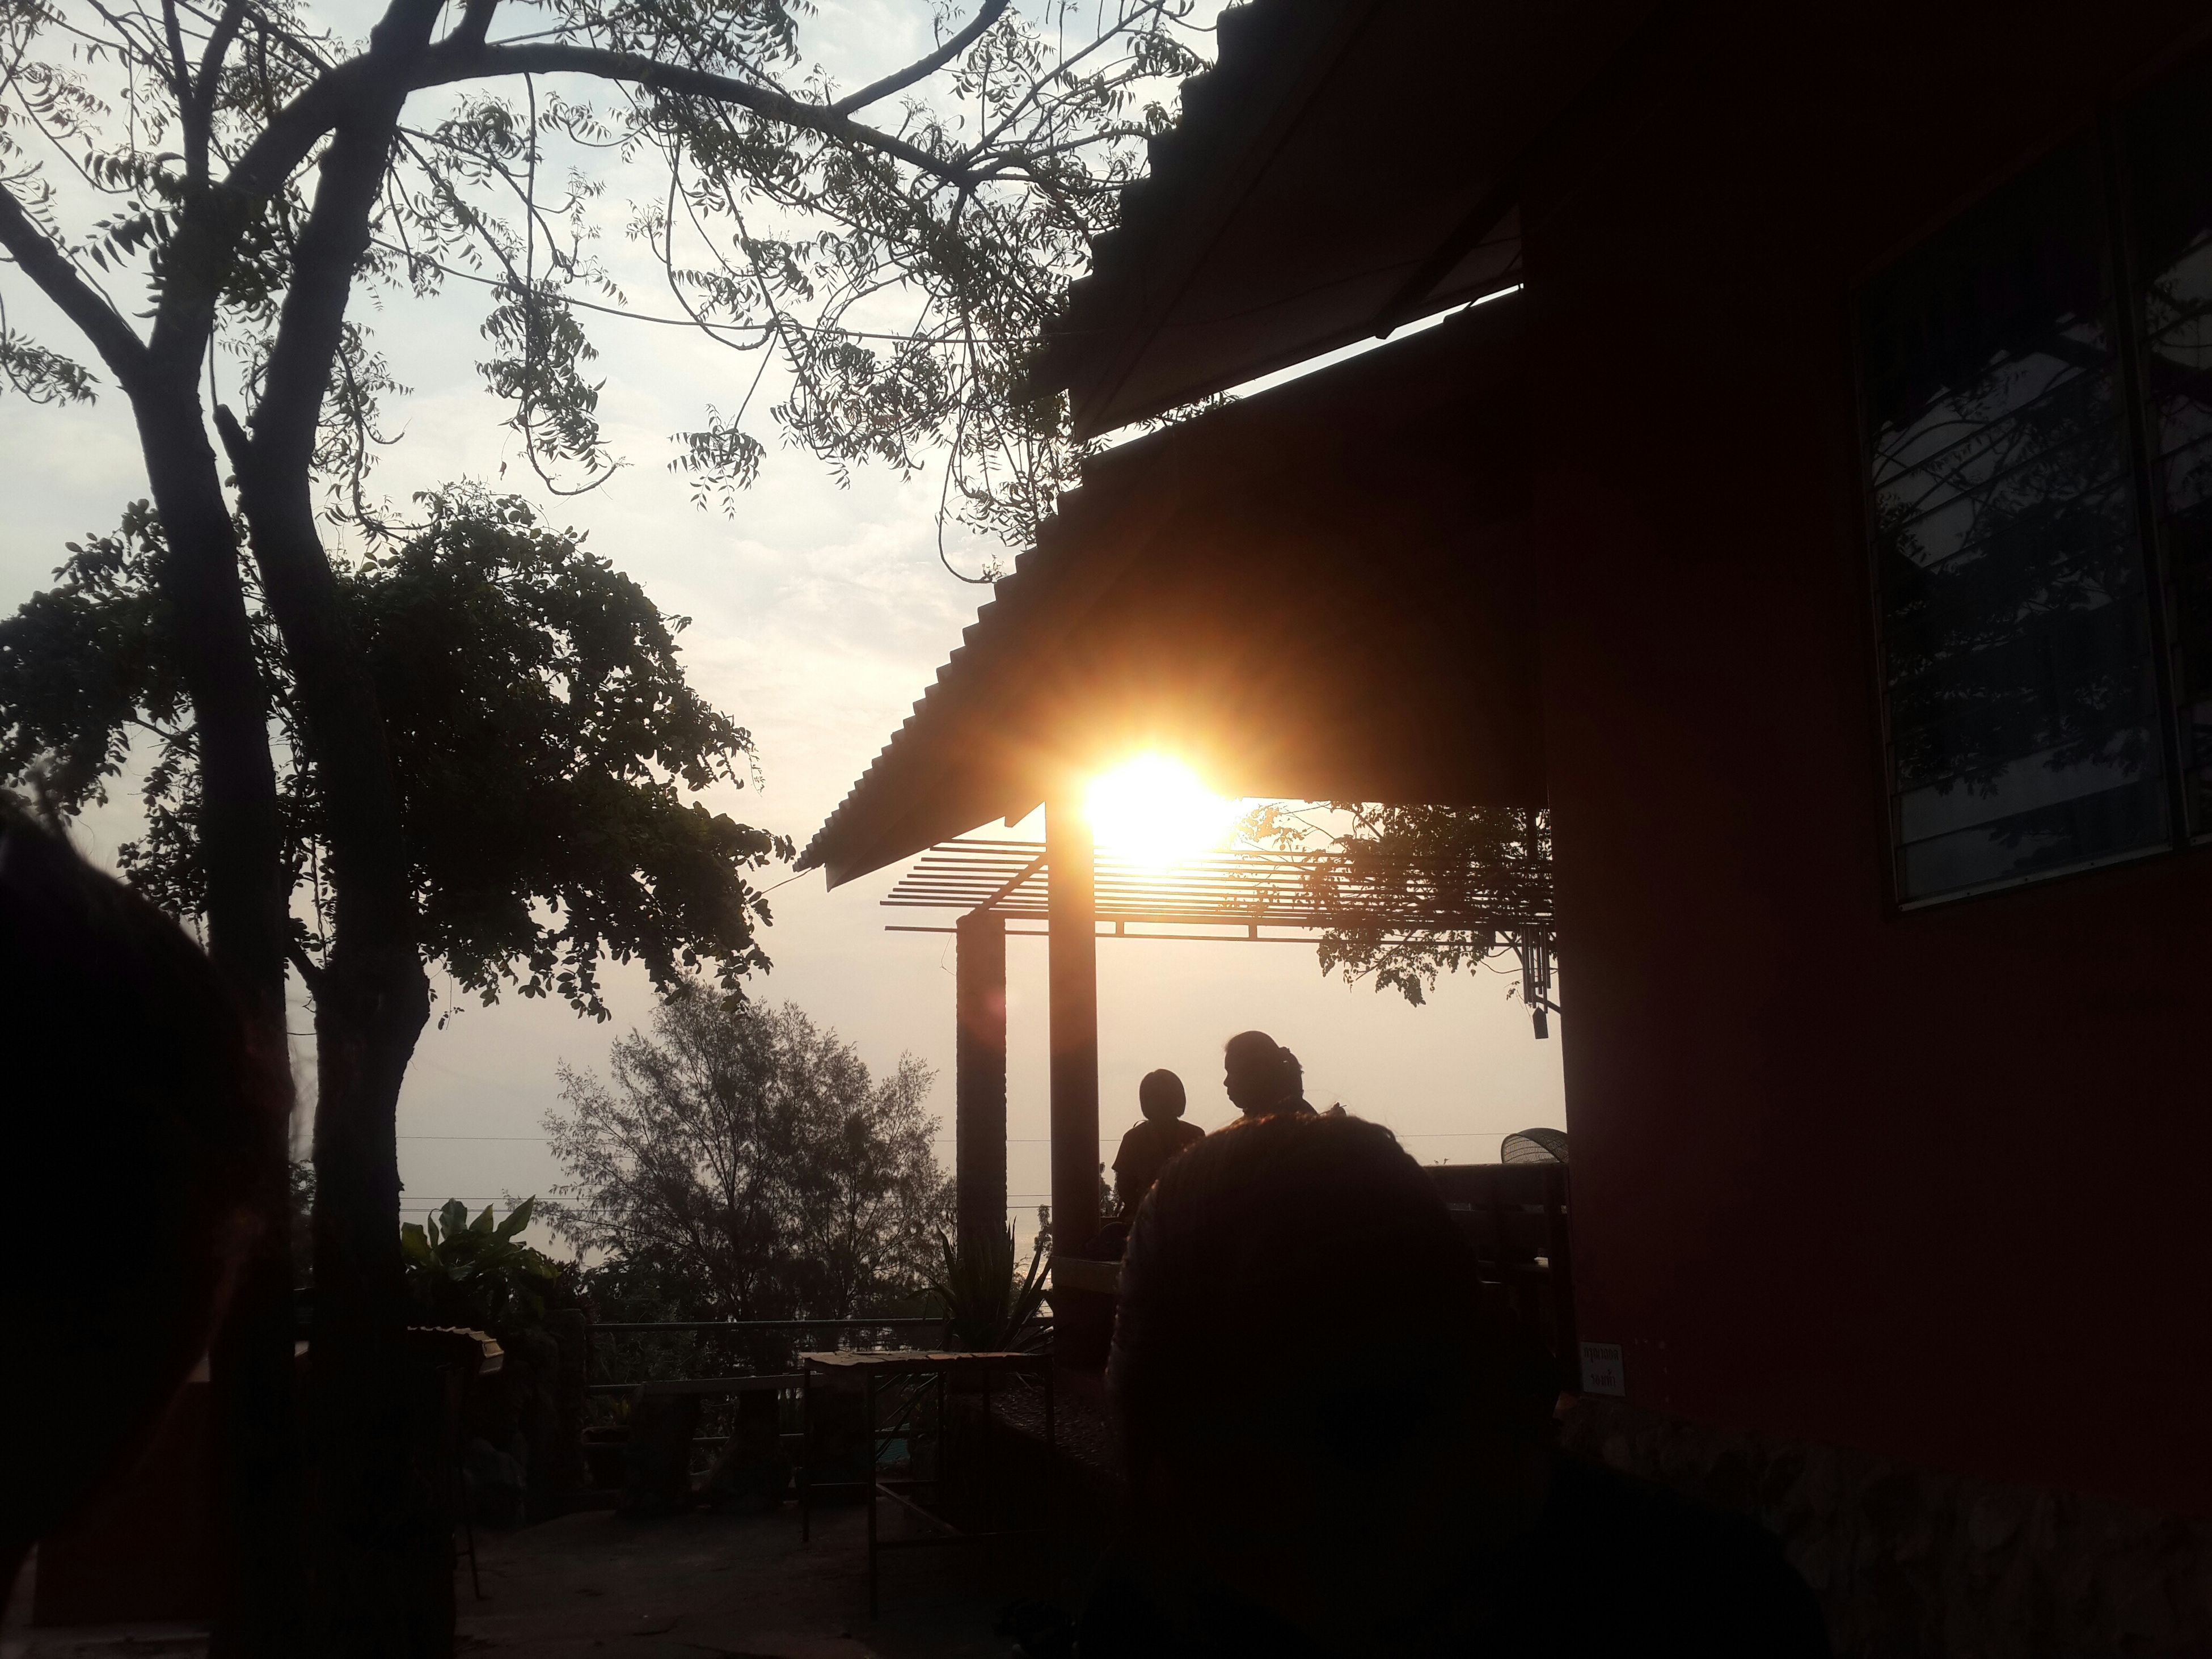 tree, silhouette, sun, sunset, sunlight, sky, built structure, men, lifestyles, lens flare, architecture, sunbeam, leisure activity, nature, clear sky, branch, person, building exterior